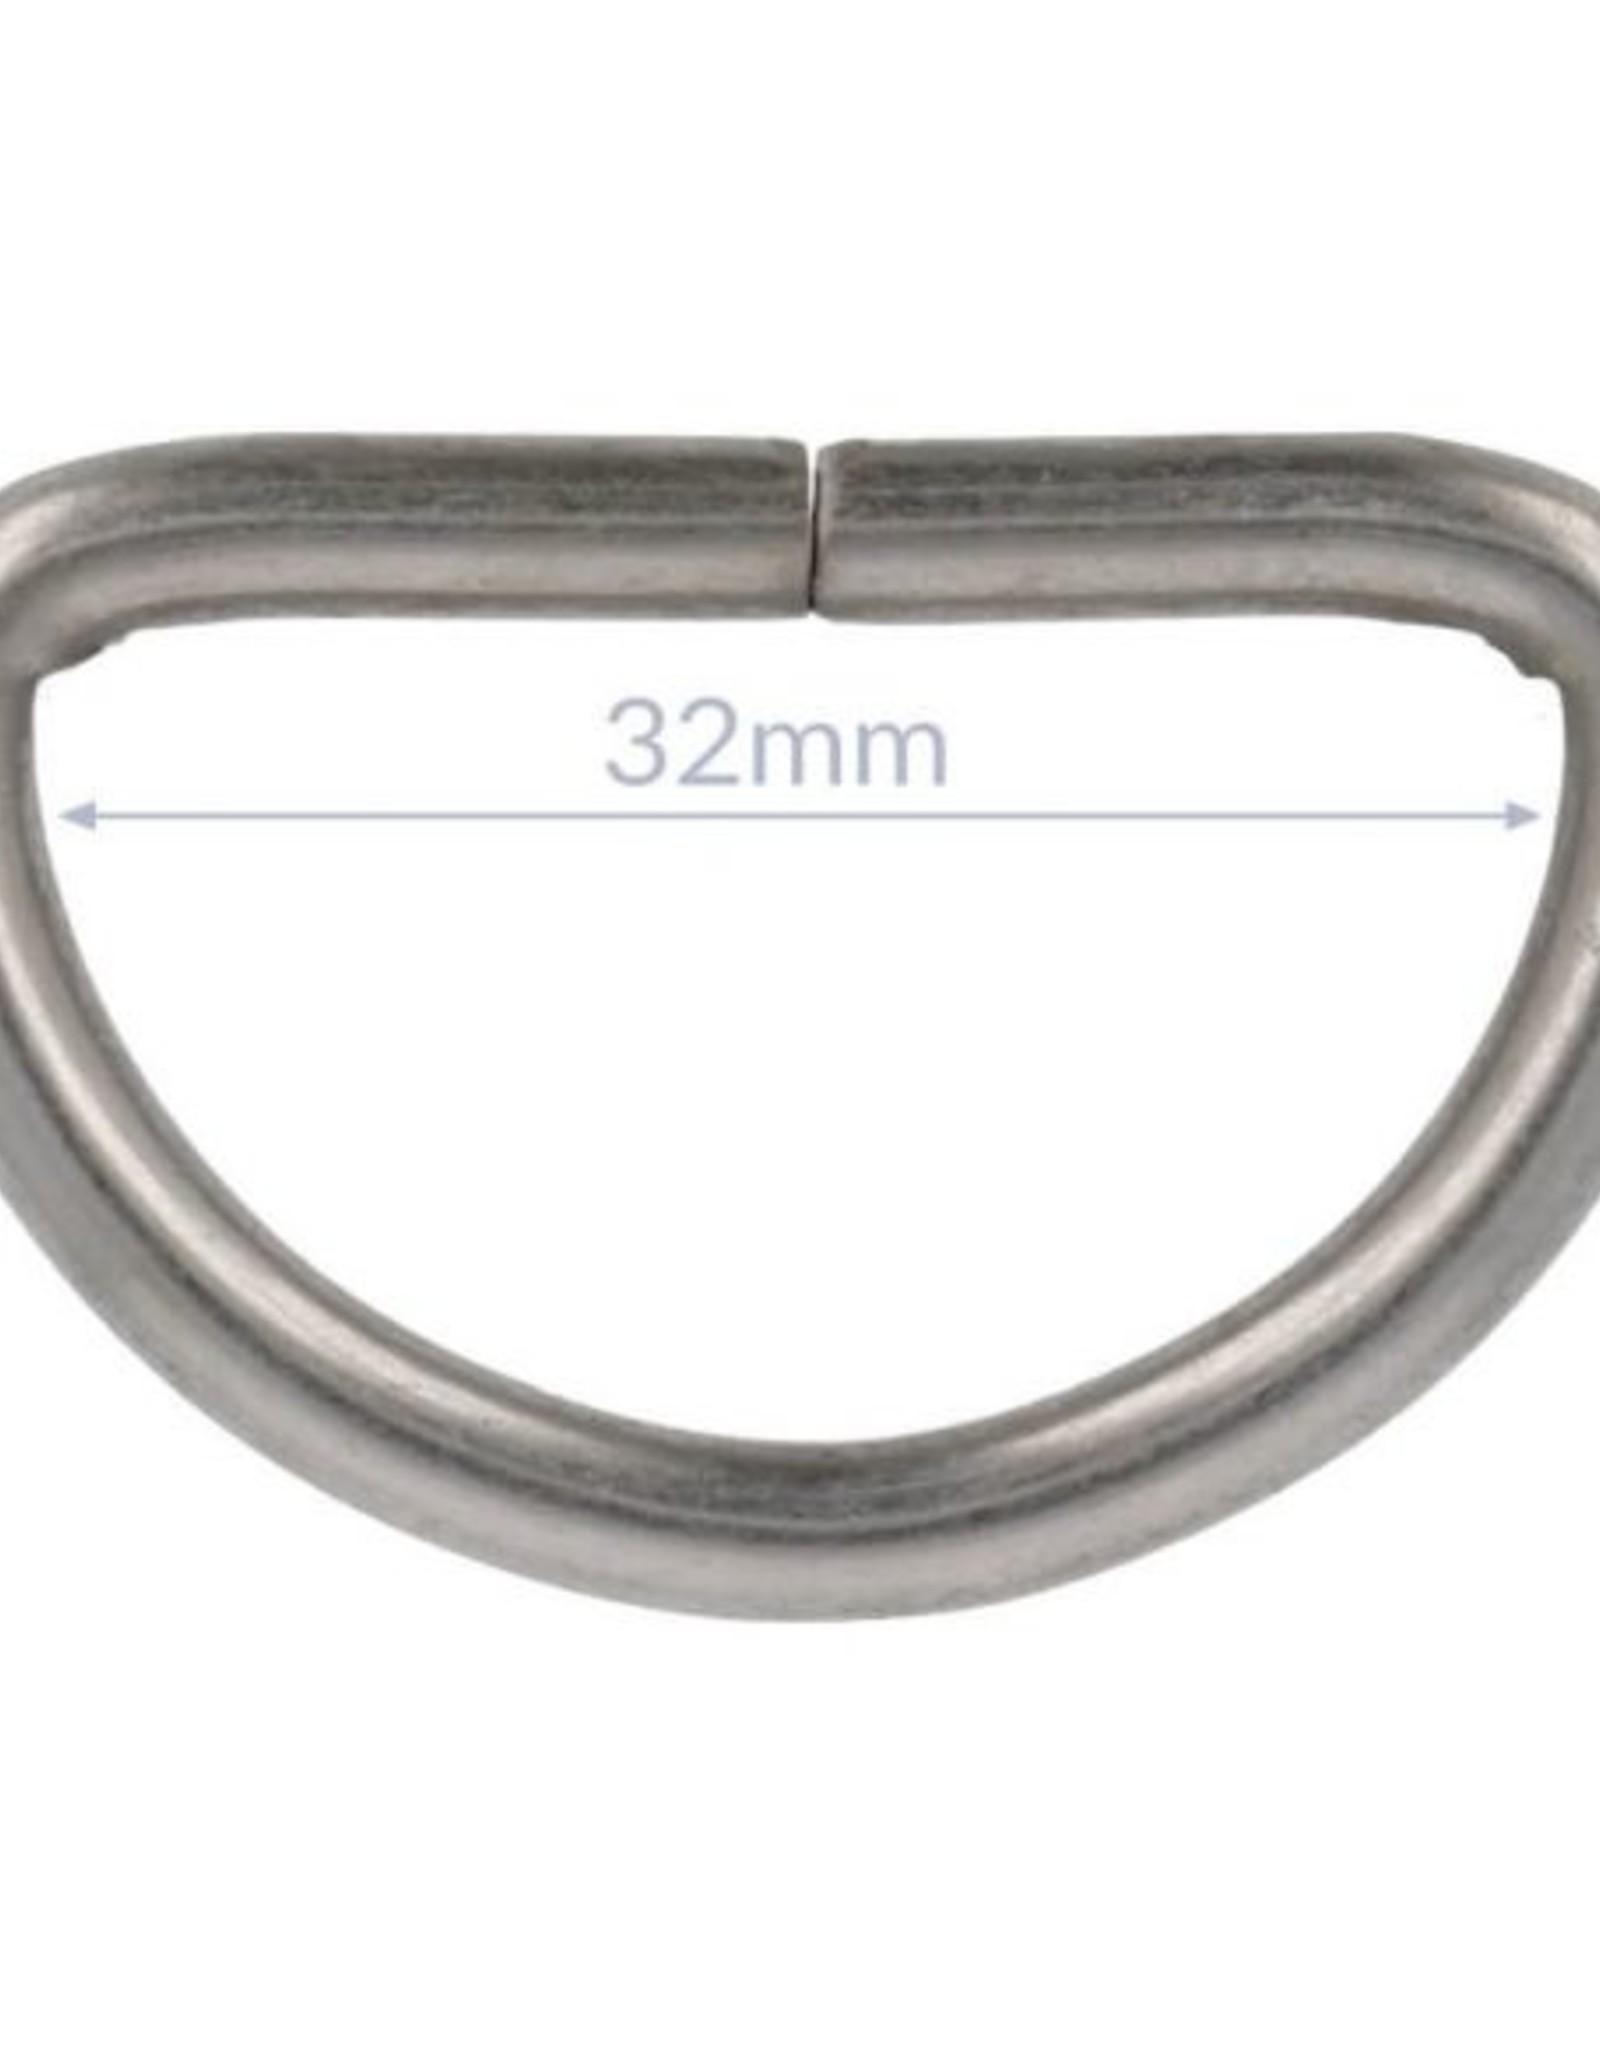 D-ring 32mm